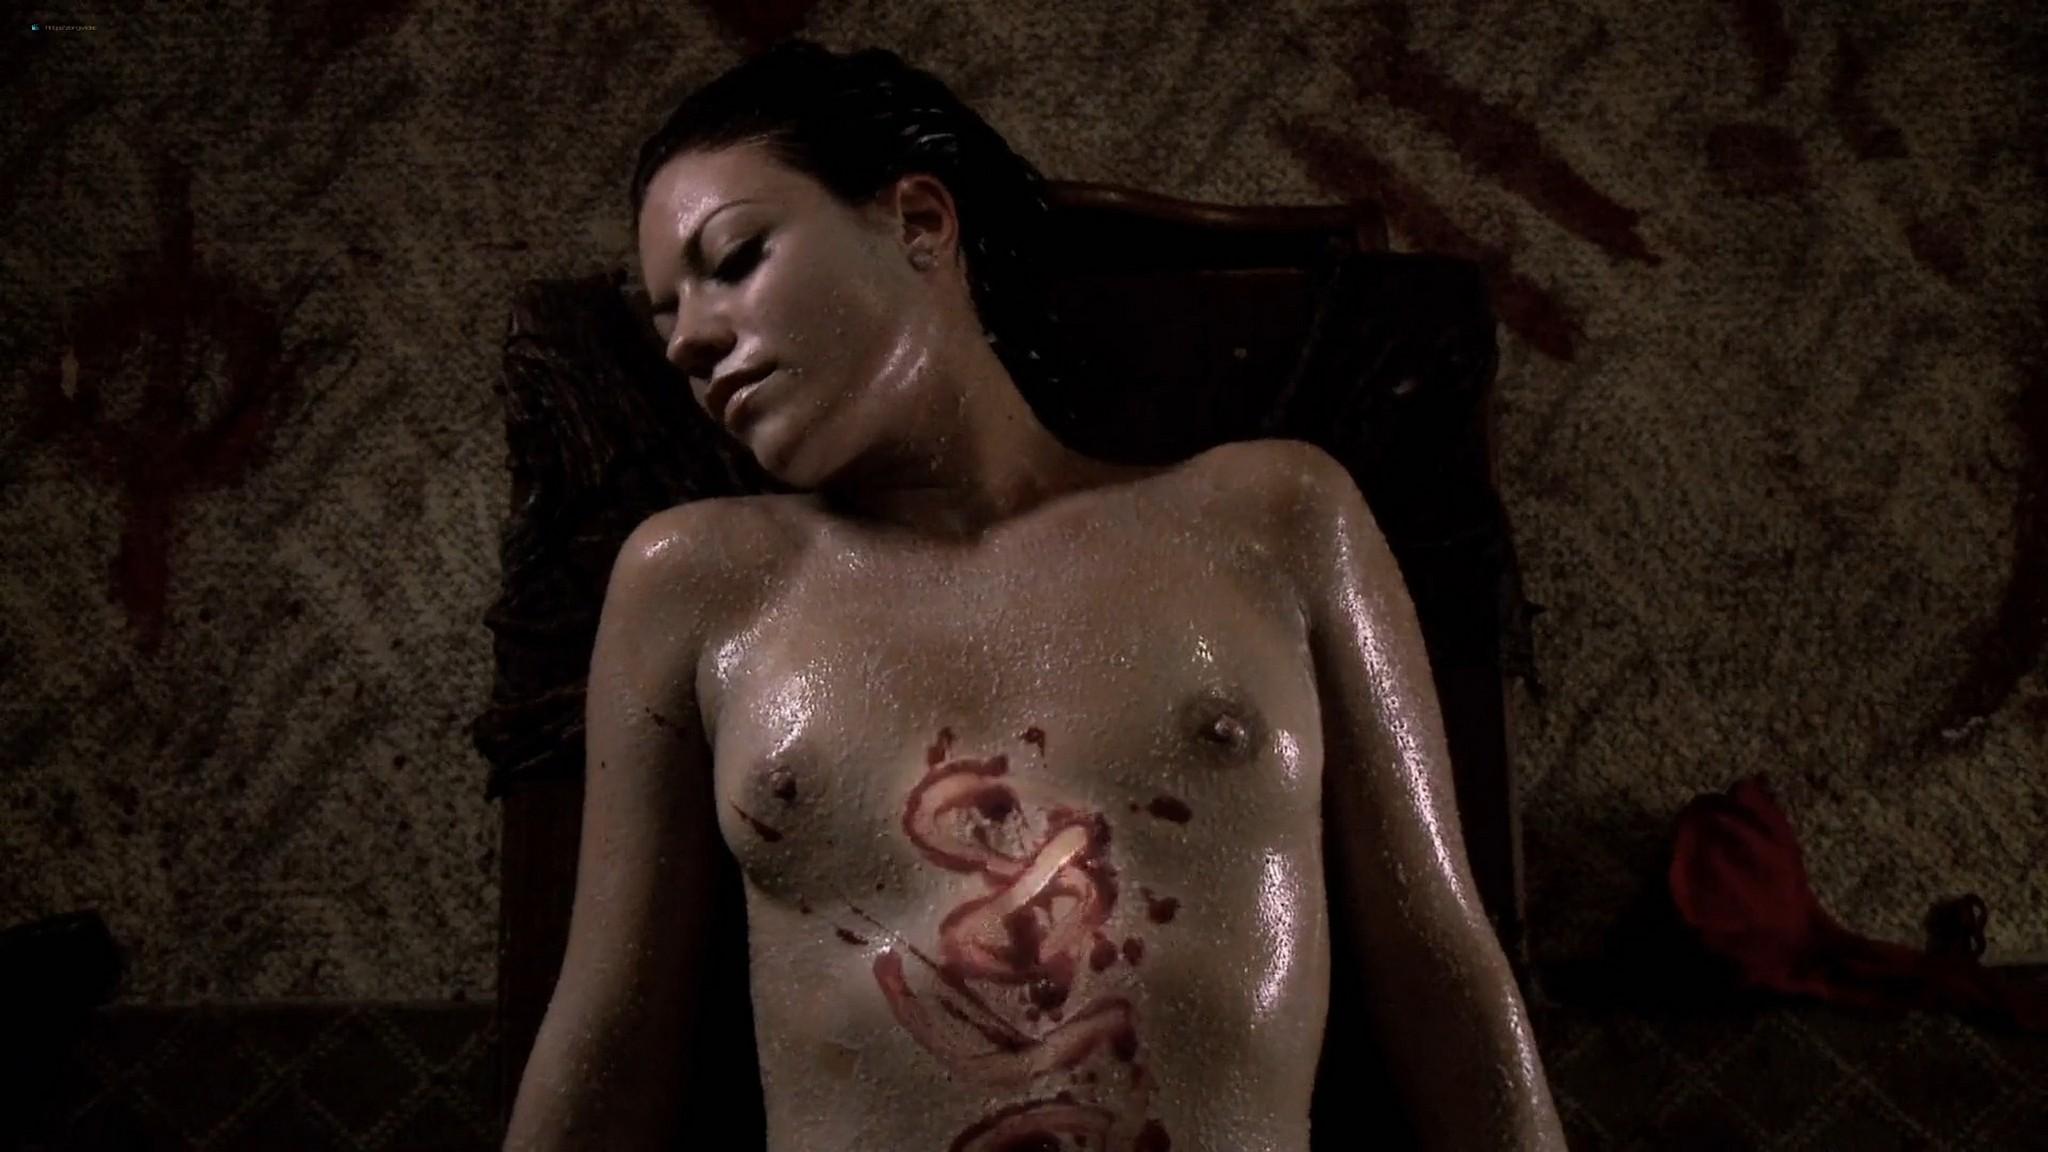 Taylor Cole hot sex Tiffany Shepis Francesca Brandelius naked The Violent Kind 2010 HD 1080p BluRay 014